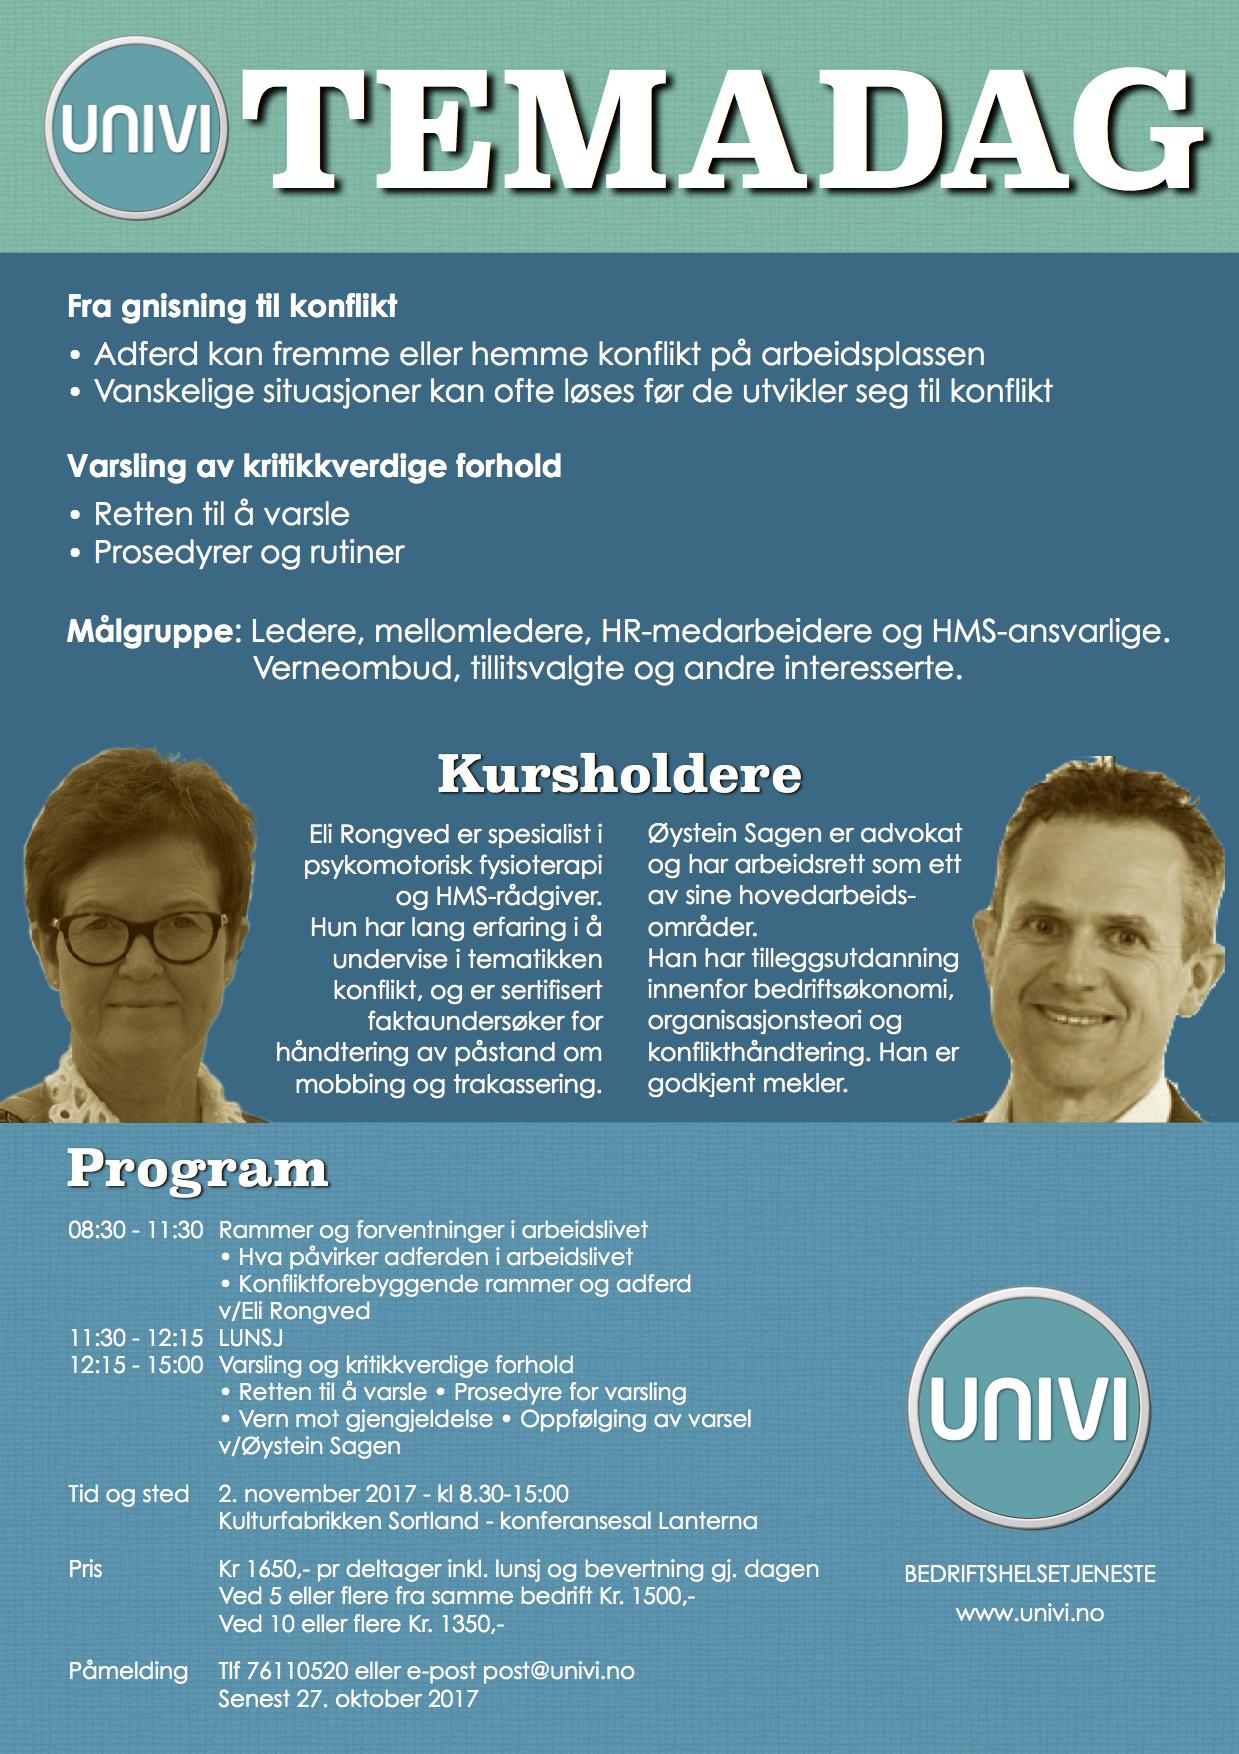 UNIVIs TEMADAG-flyer-5s.png